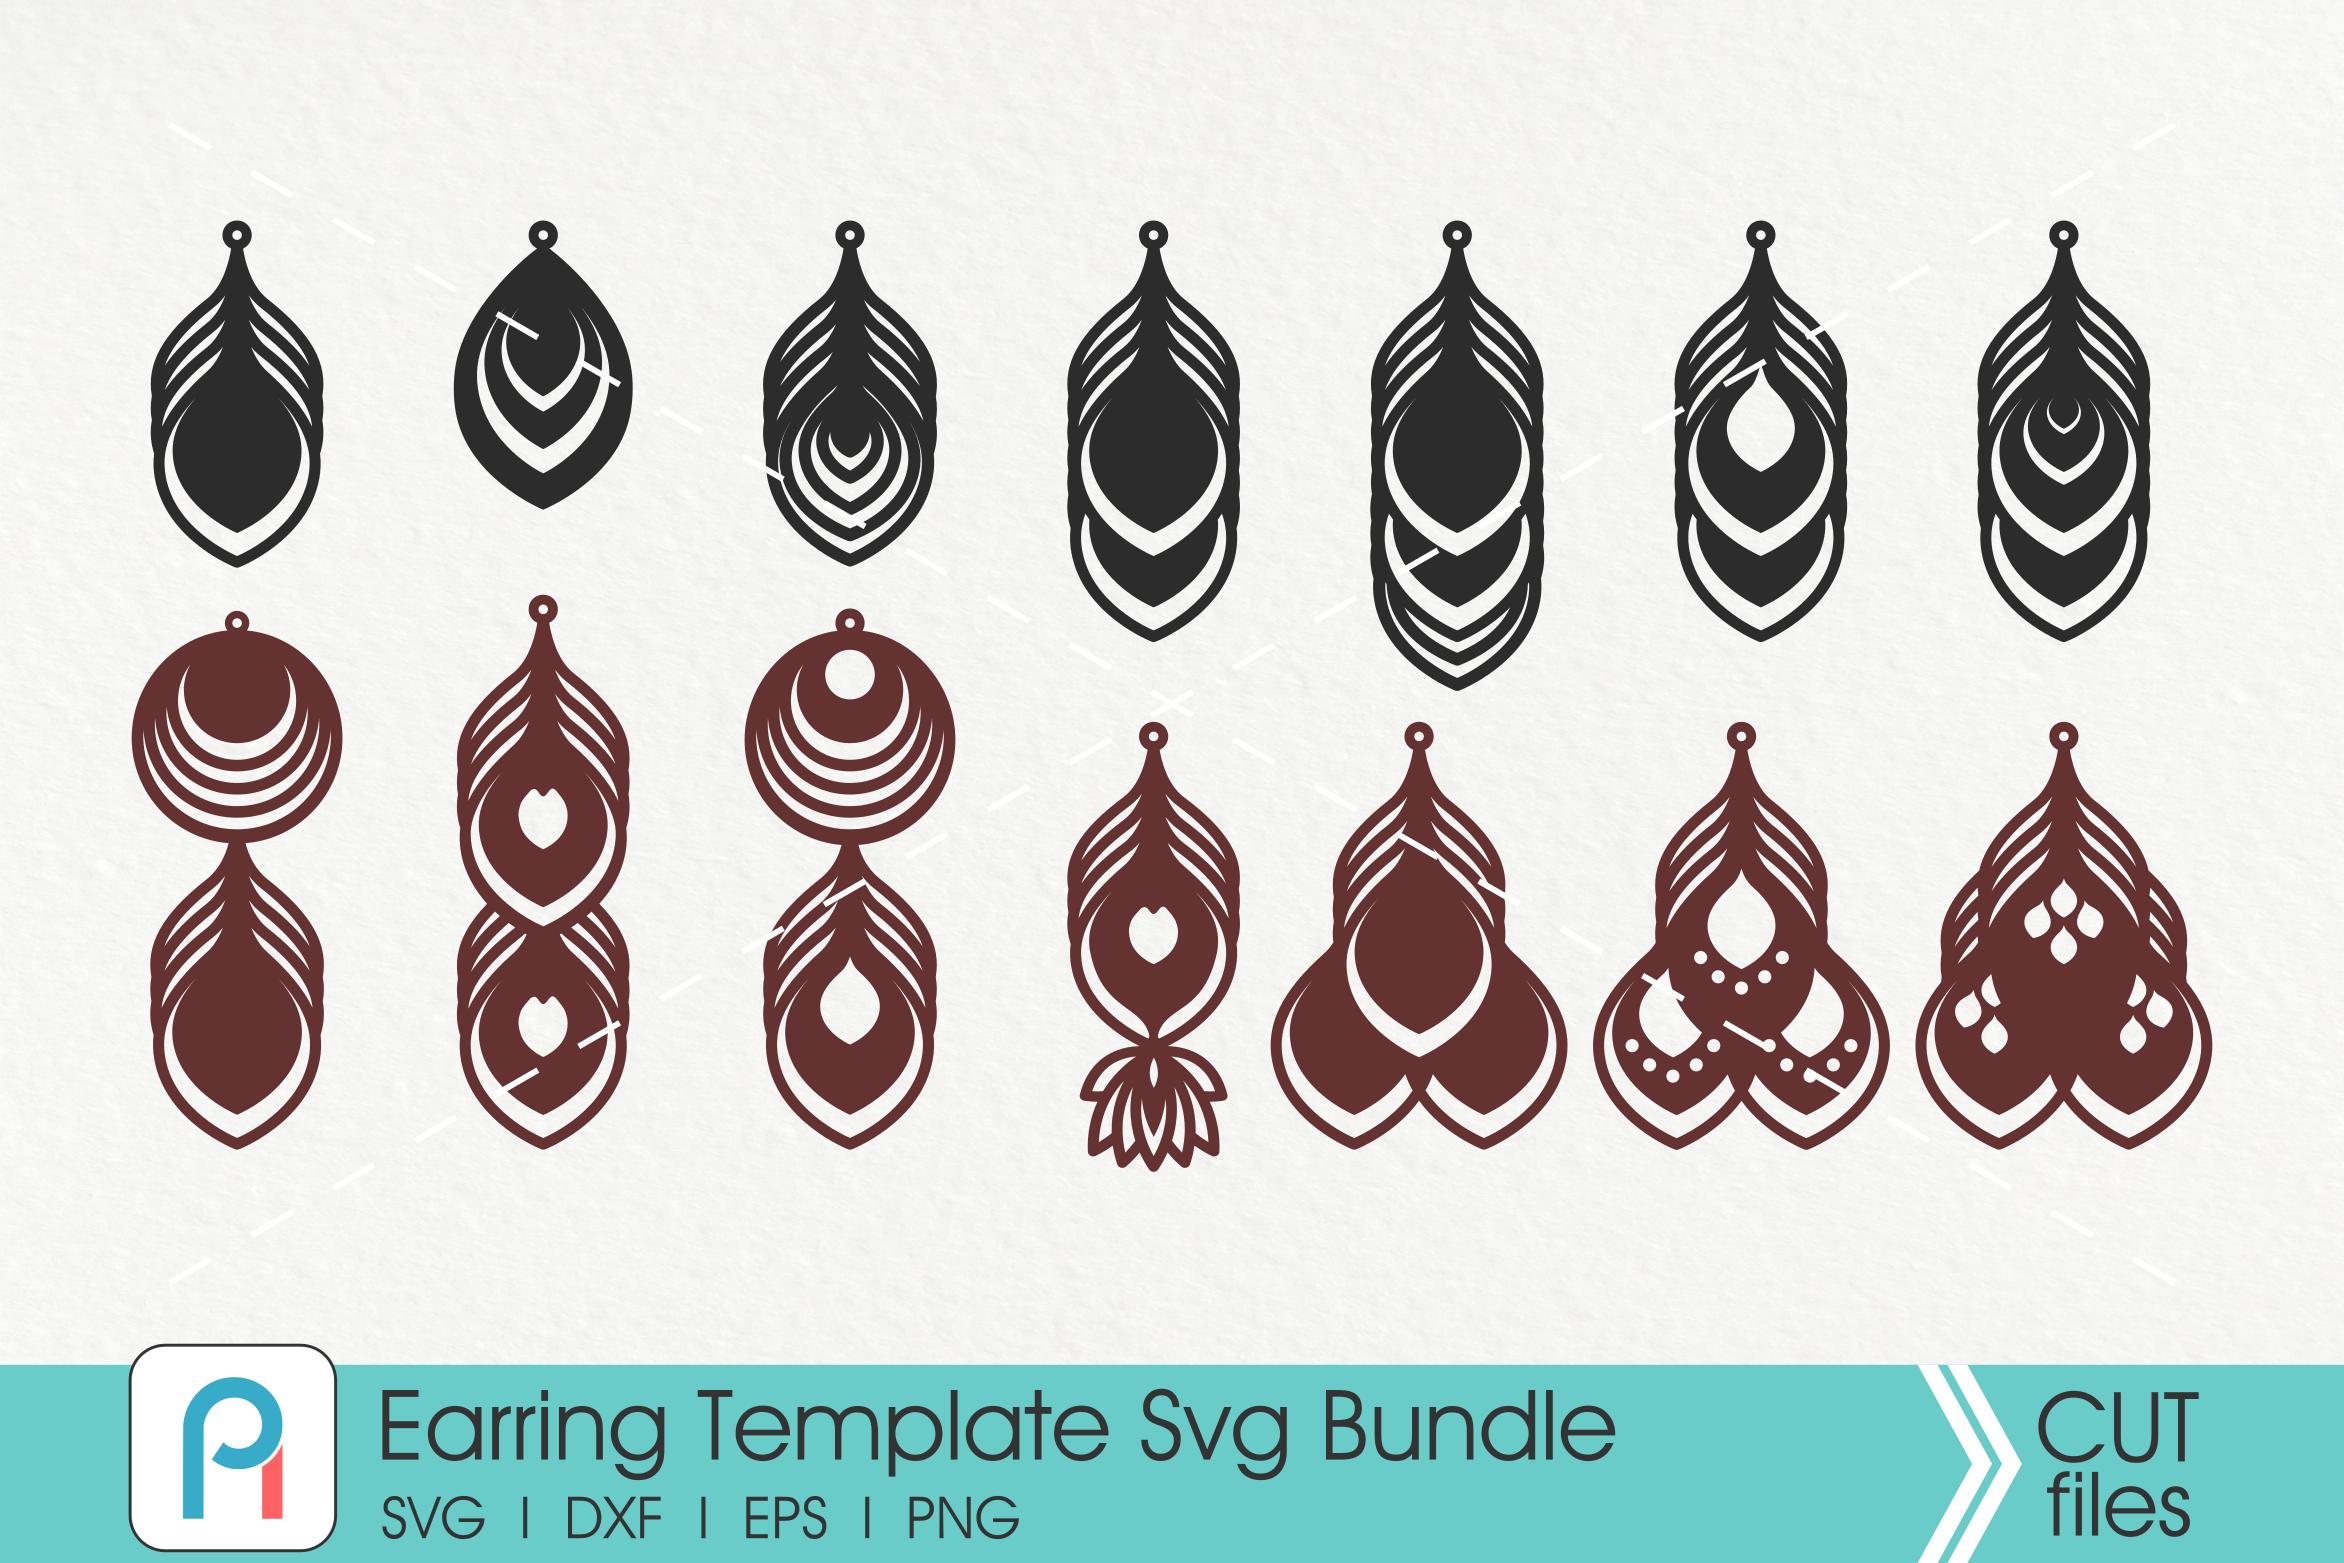 Earrings Svg Earrings Template Svg Leather Earrings Svg By